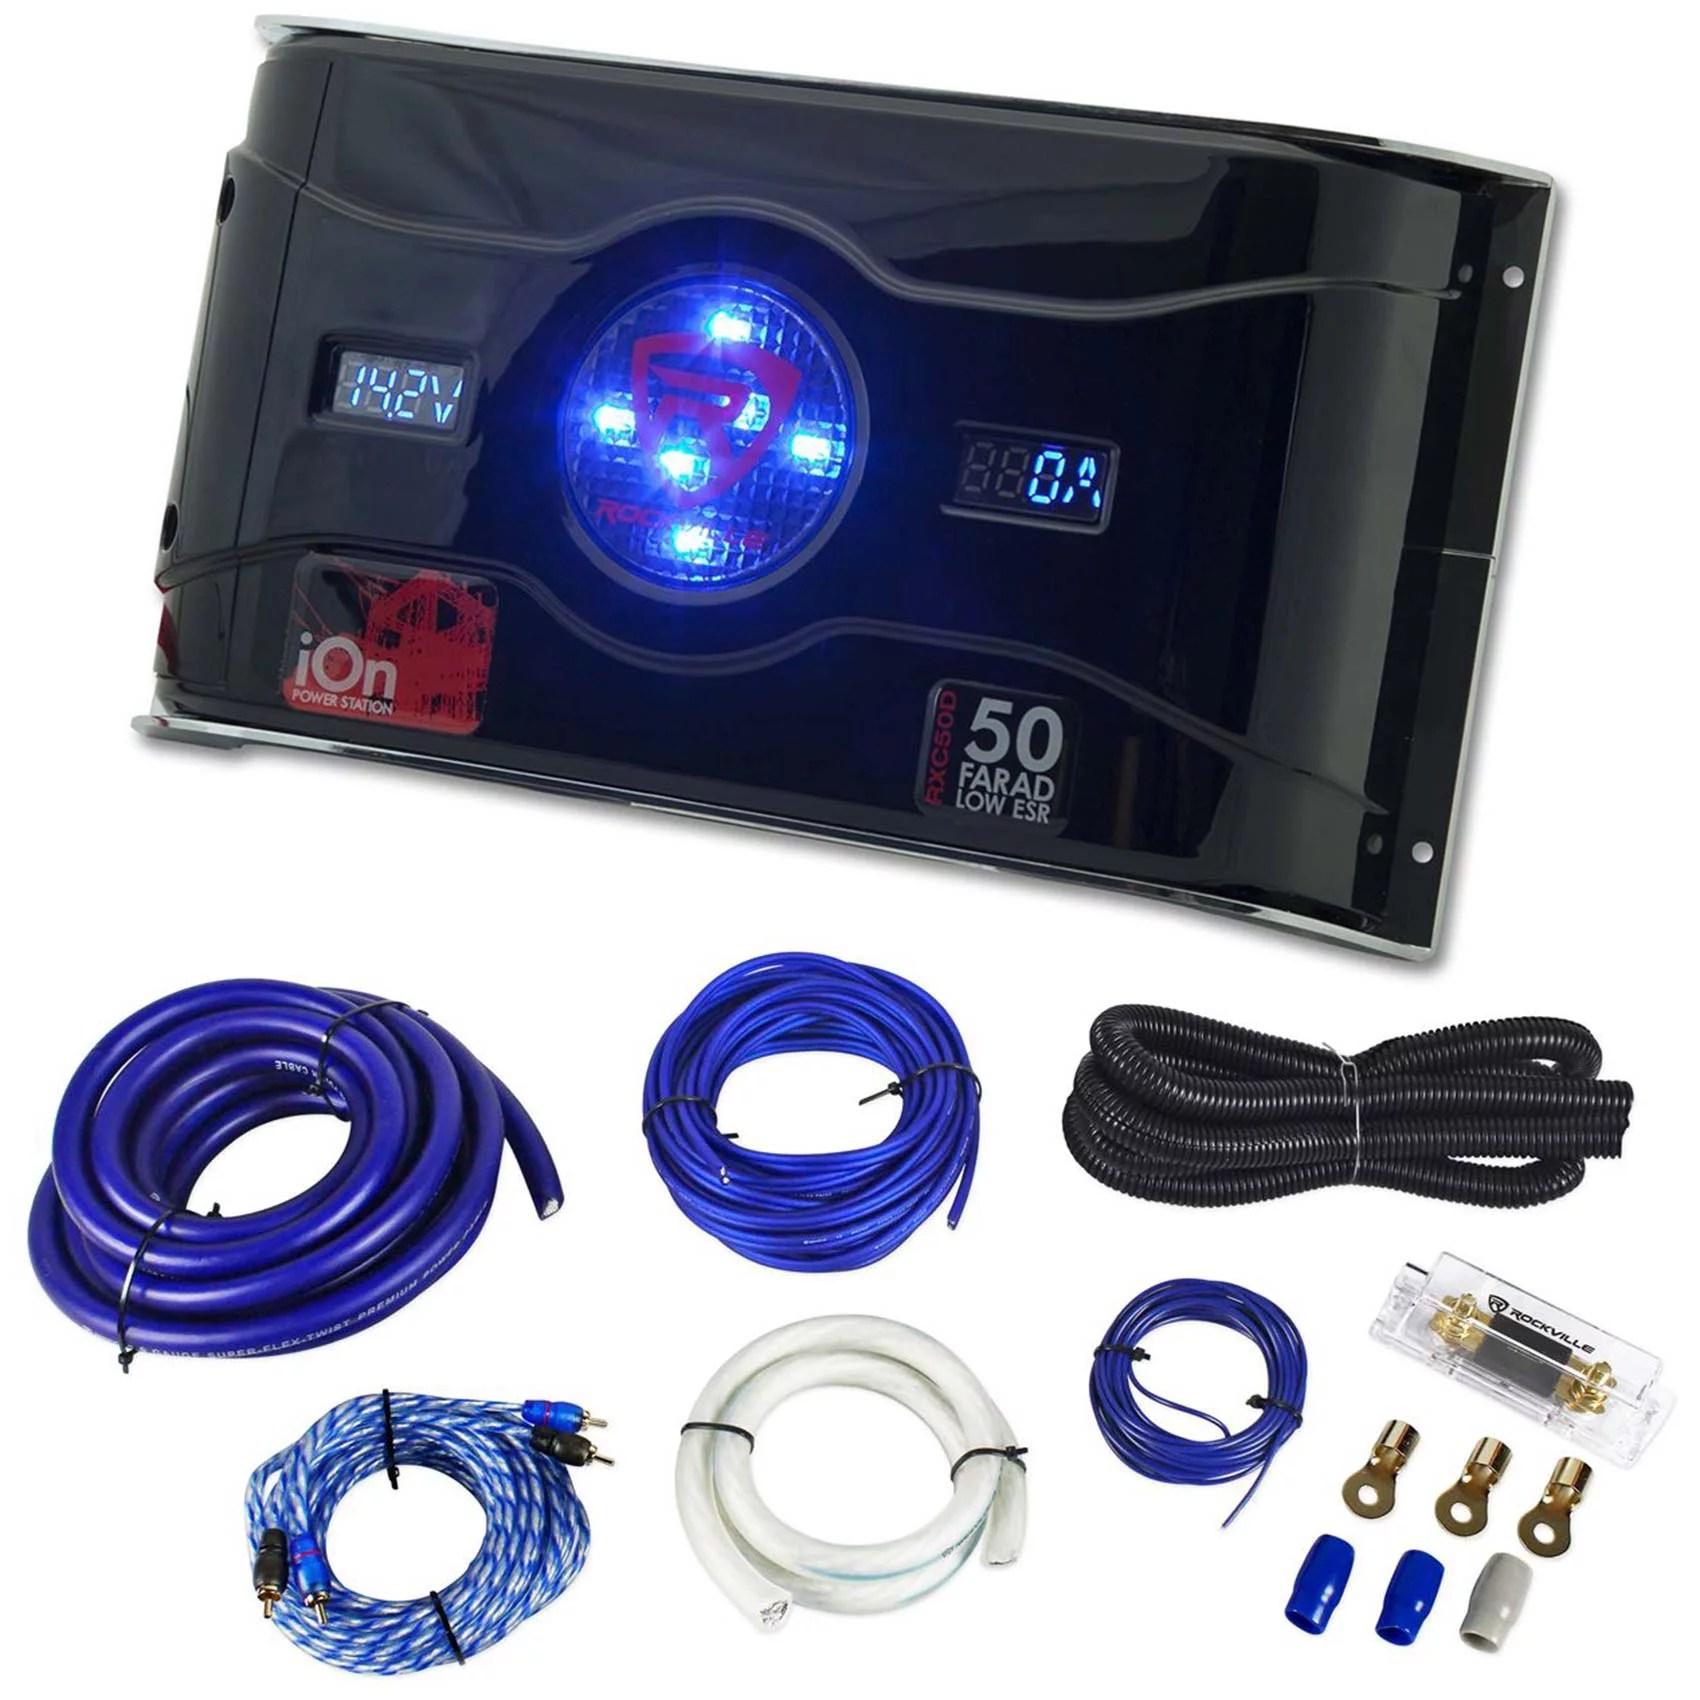 hight resolution of rockville 50 farad hybrid led car capacitor w dual meters 0 gauge amp wire kit car amp wiring kit walmart